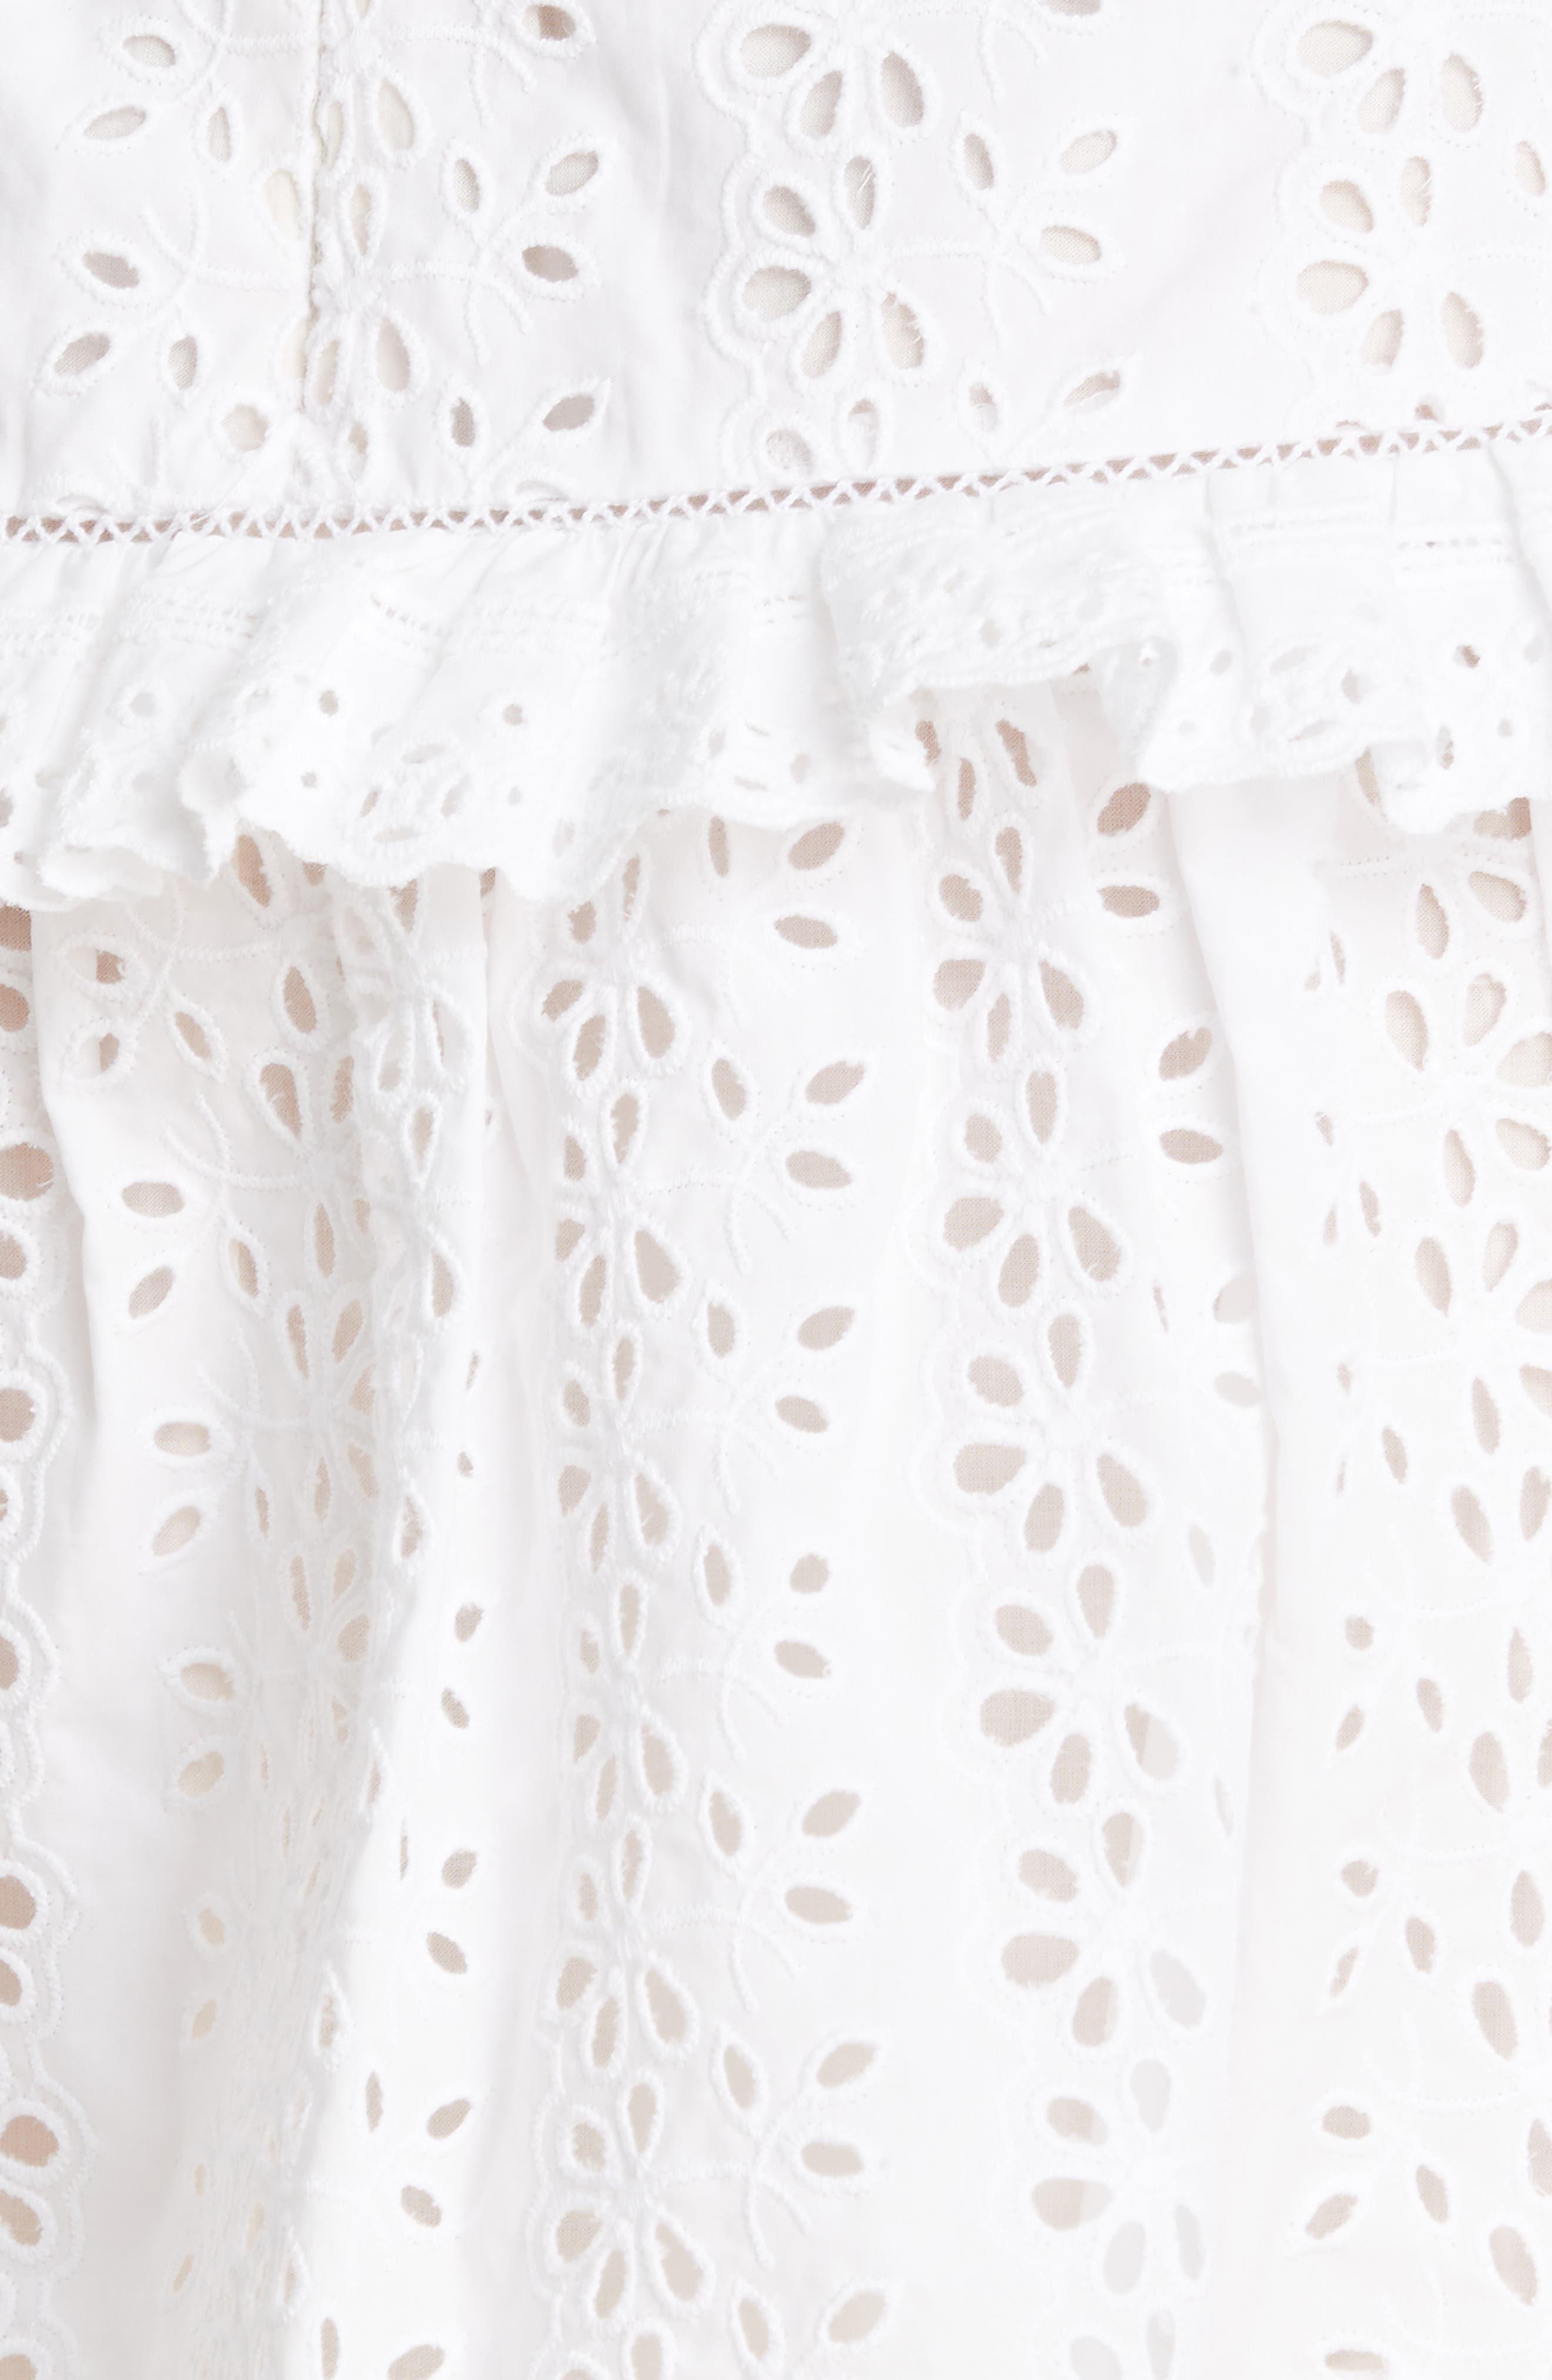 REBECCA TAYLOR, Karina Cotton Eyelet Skirt, Alternate thumbnail 5, color, MILK